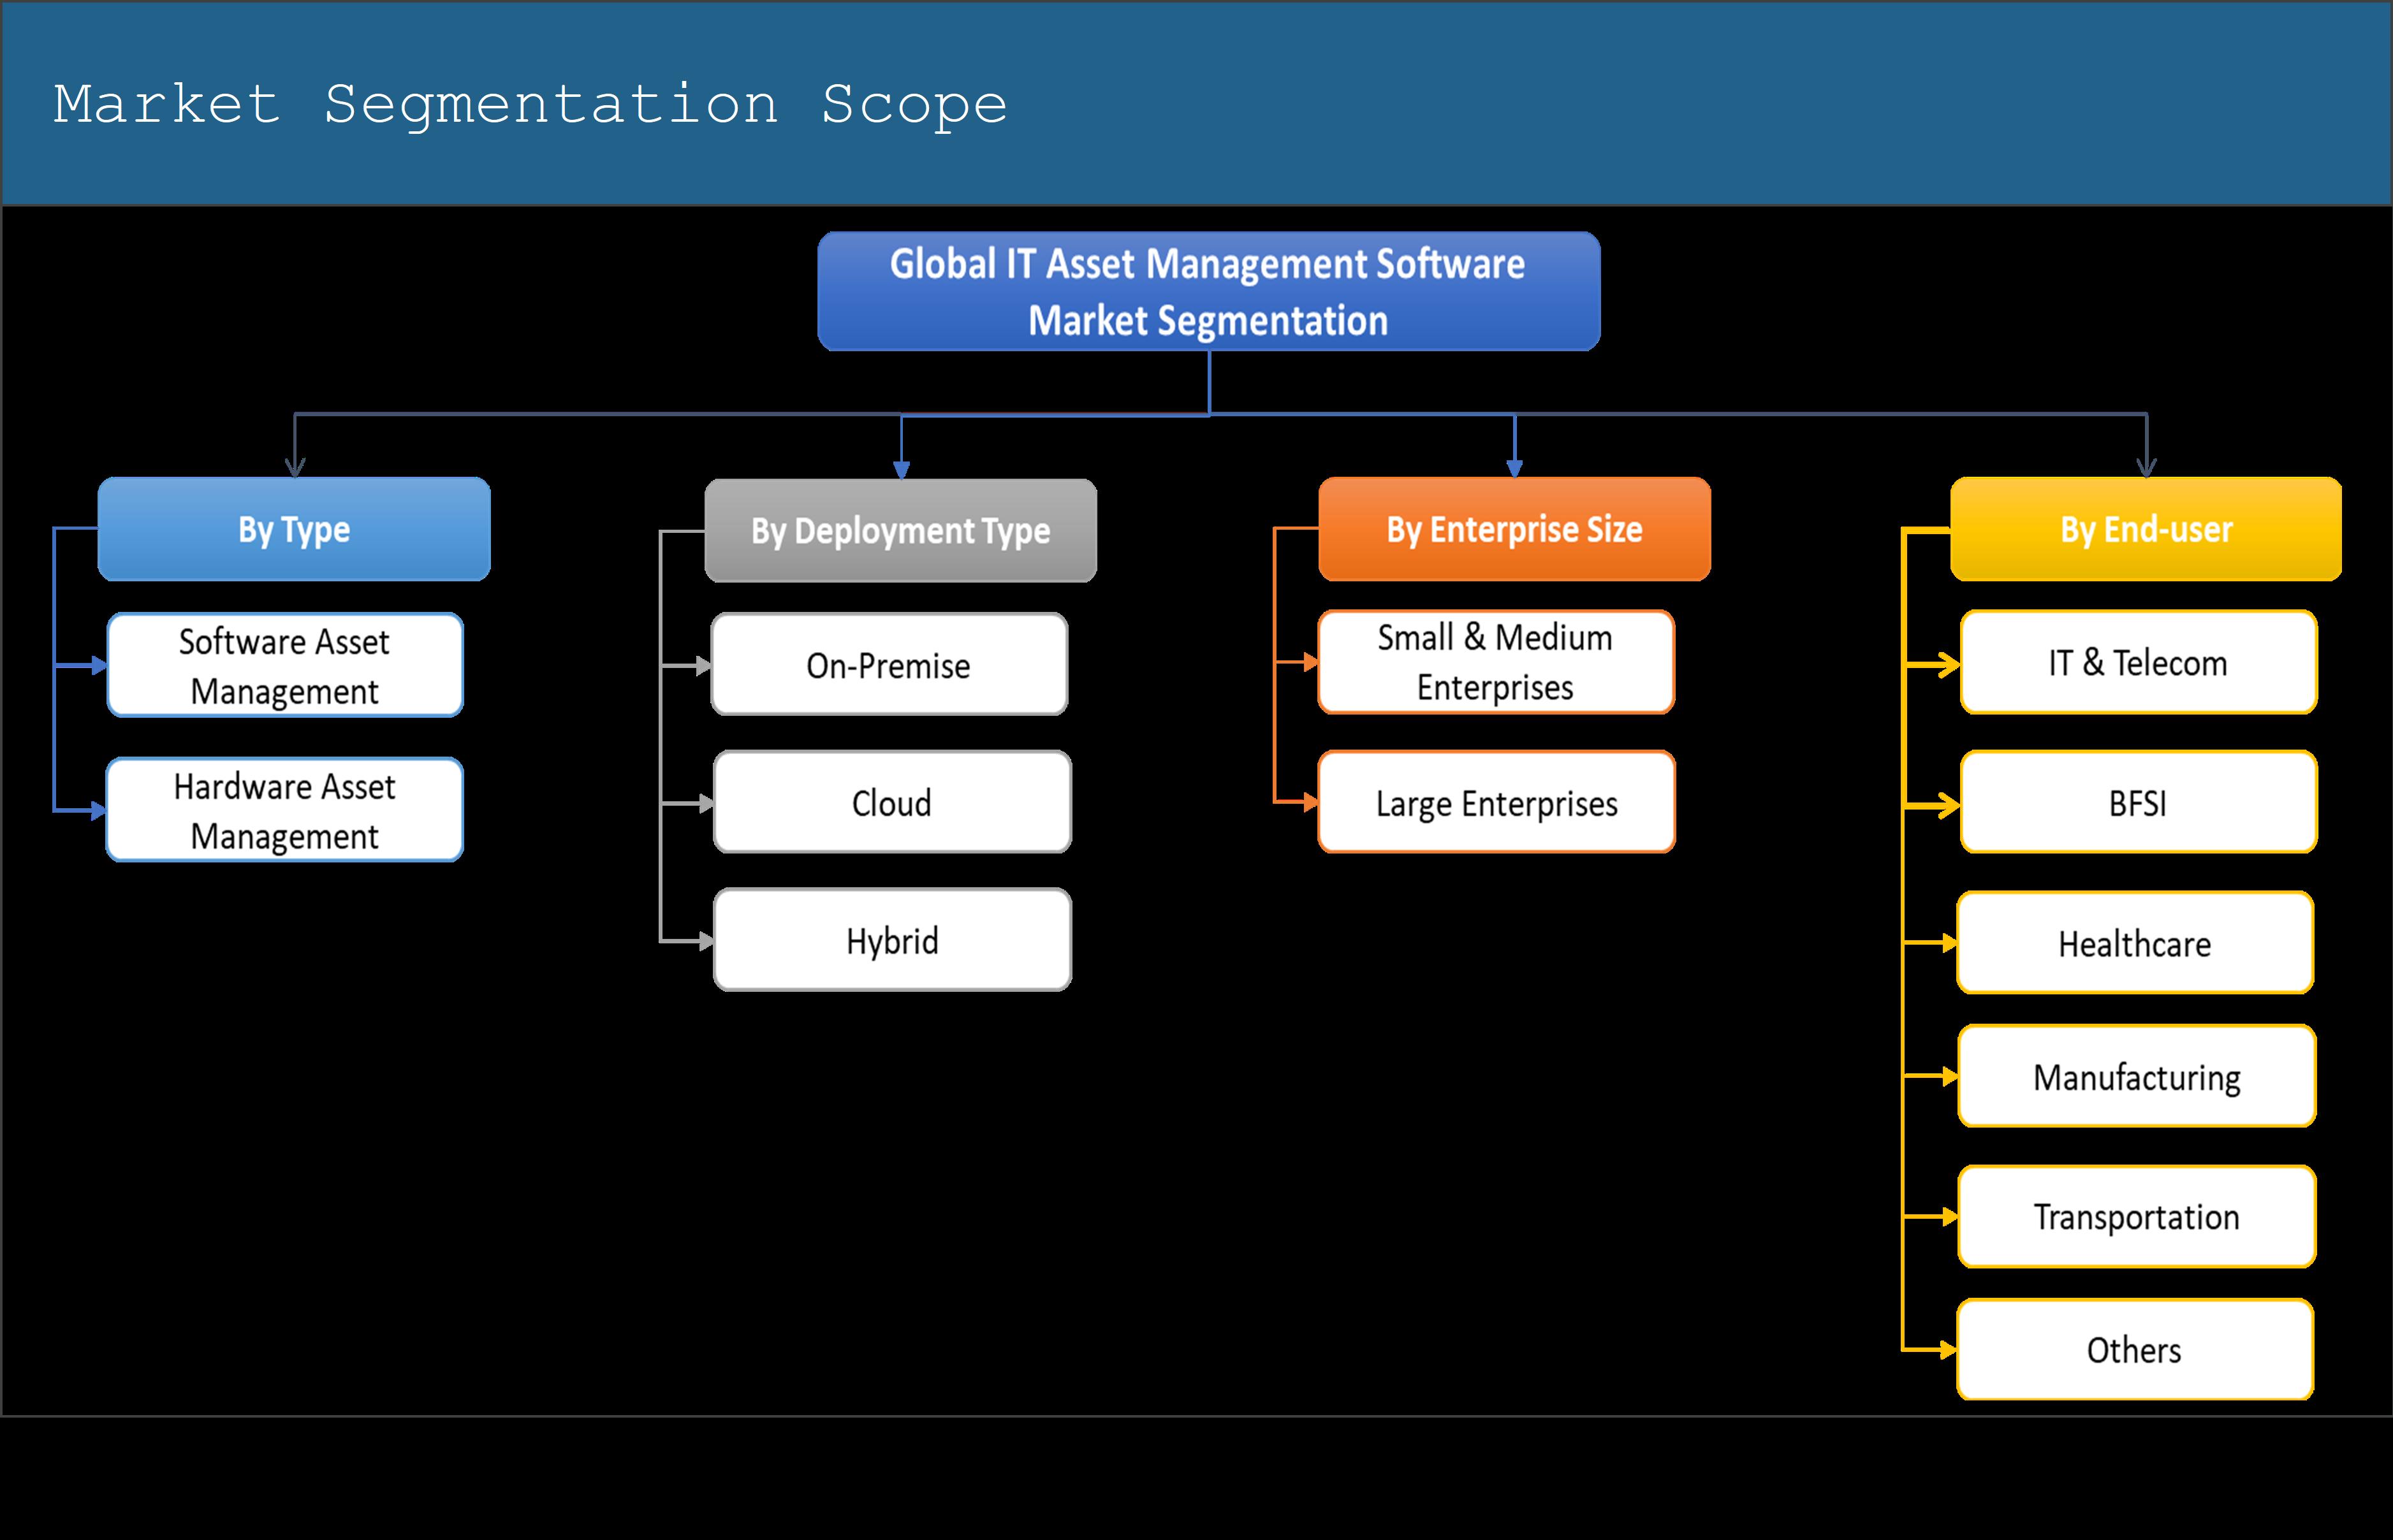 Global IT Asset Management Software Market Segmentation